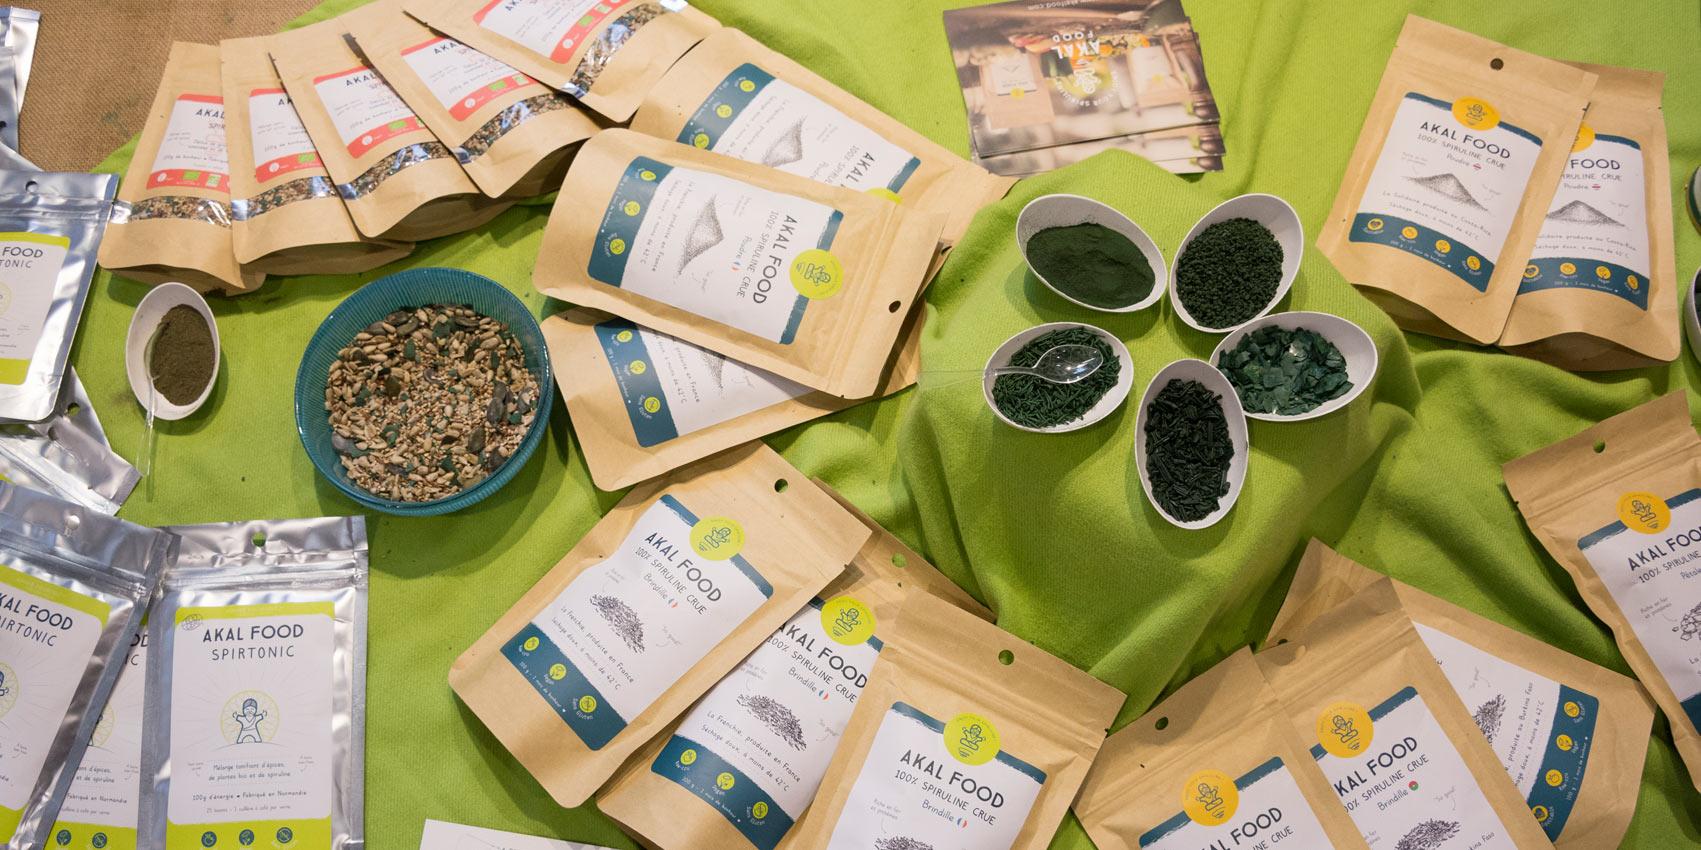 Création de la marque Akal Food